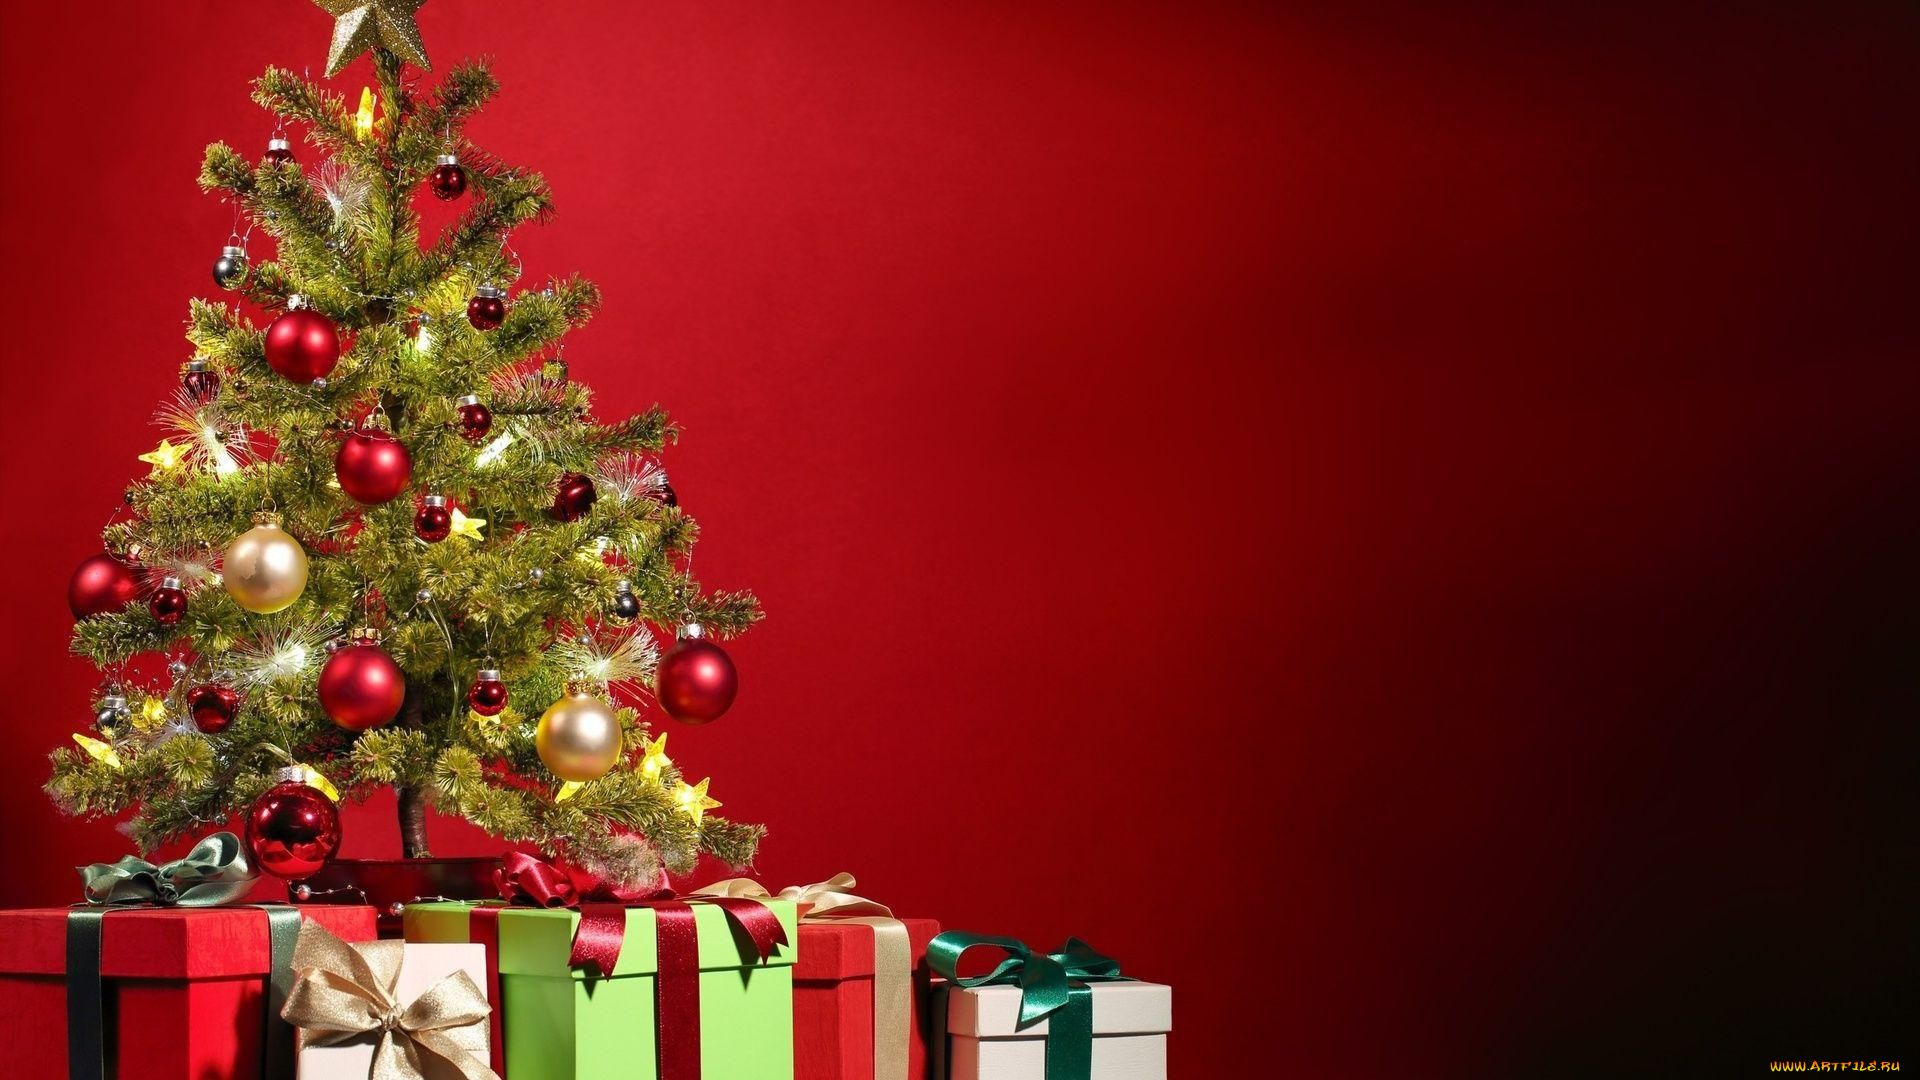 Christmas Tree High Definition